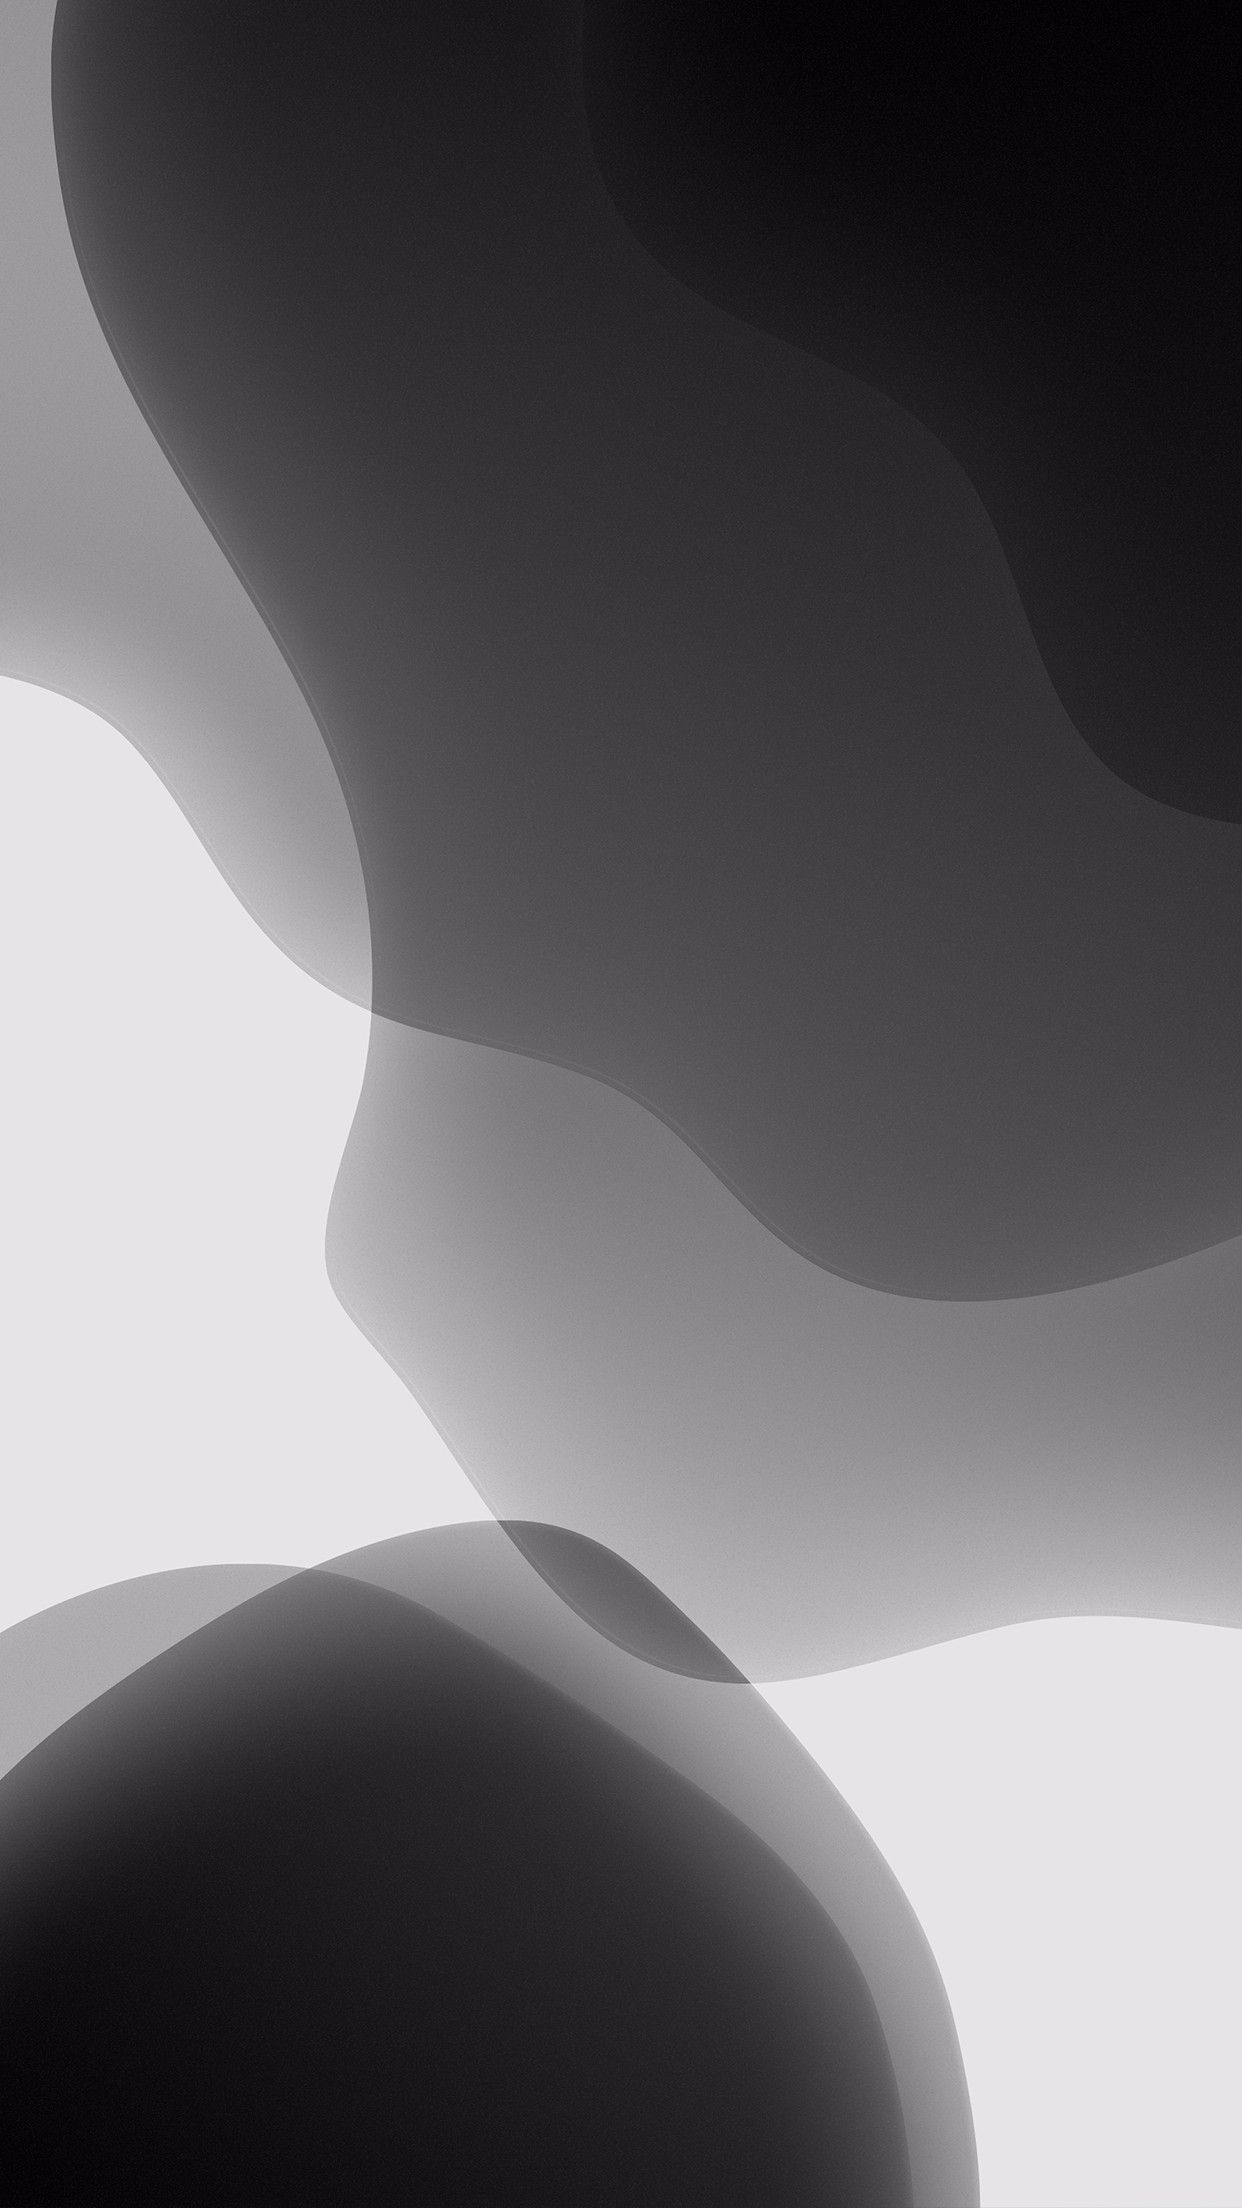 Blue iOS 13 redo by AR72014 on Twitter New wallpaper